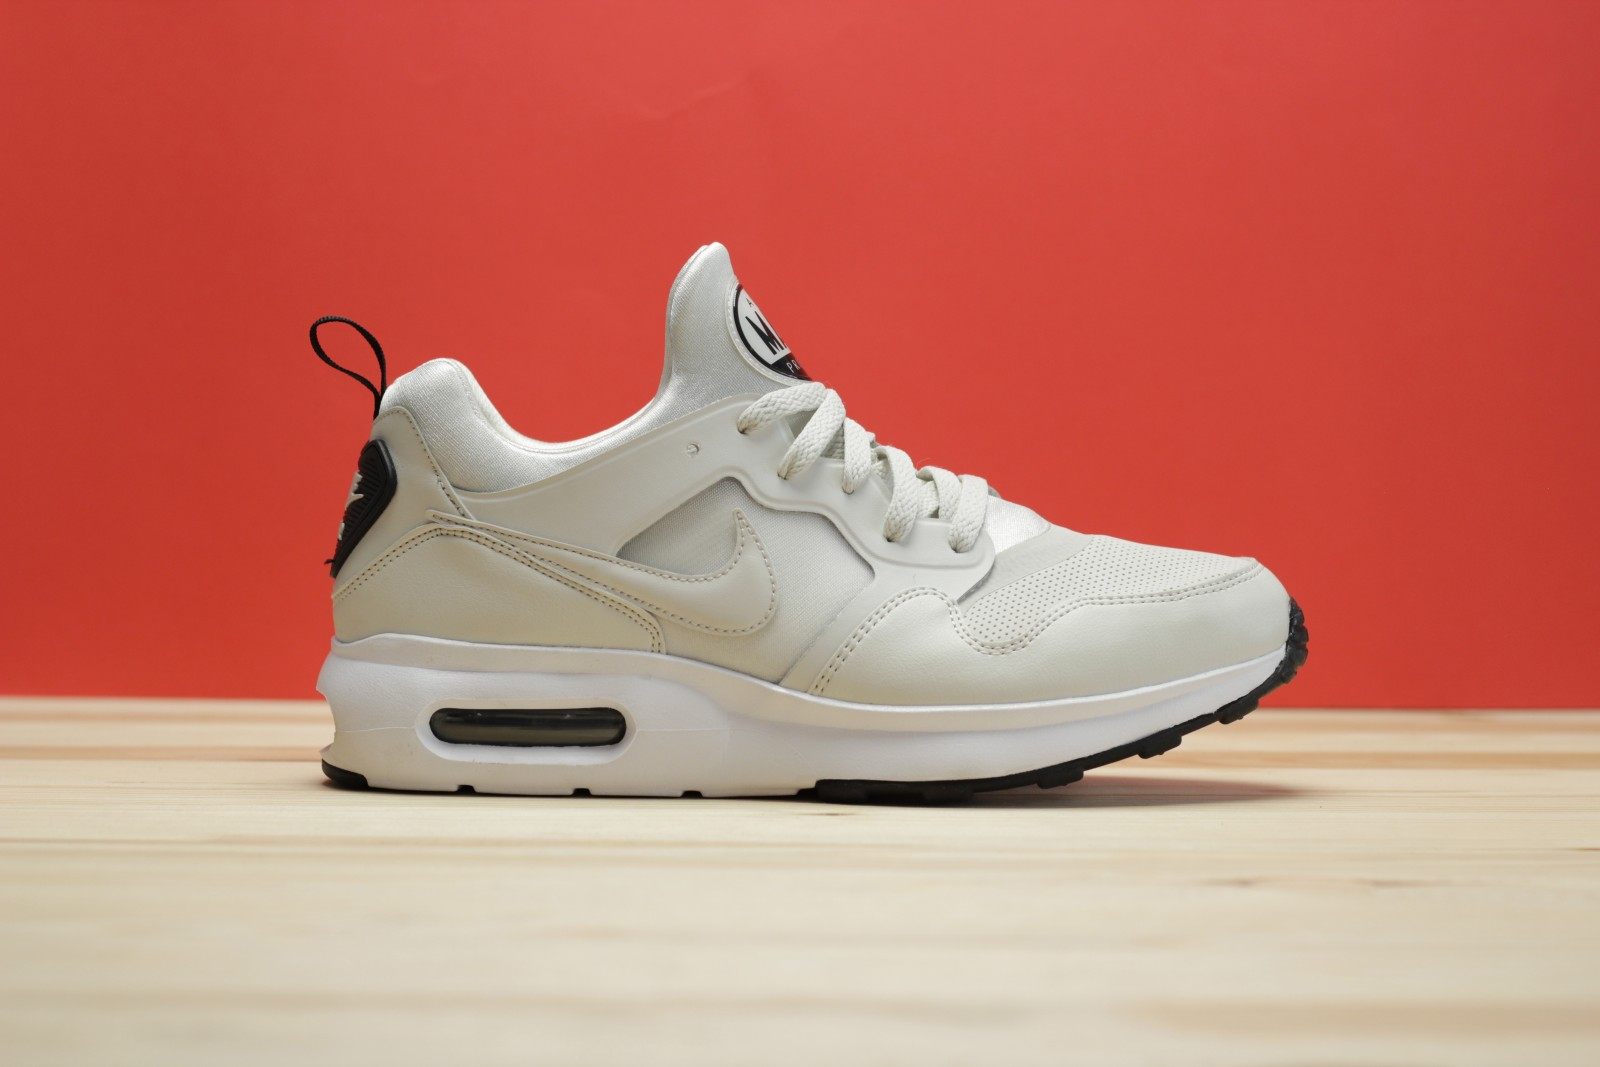 8b8a219b746 Pánské tenisky Nike AIR MAX PRIME SL